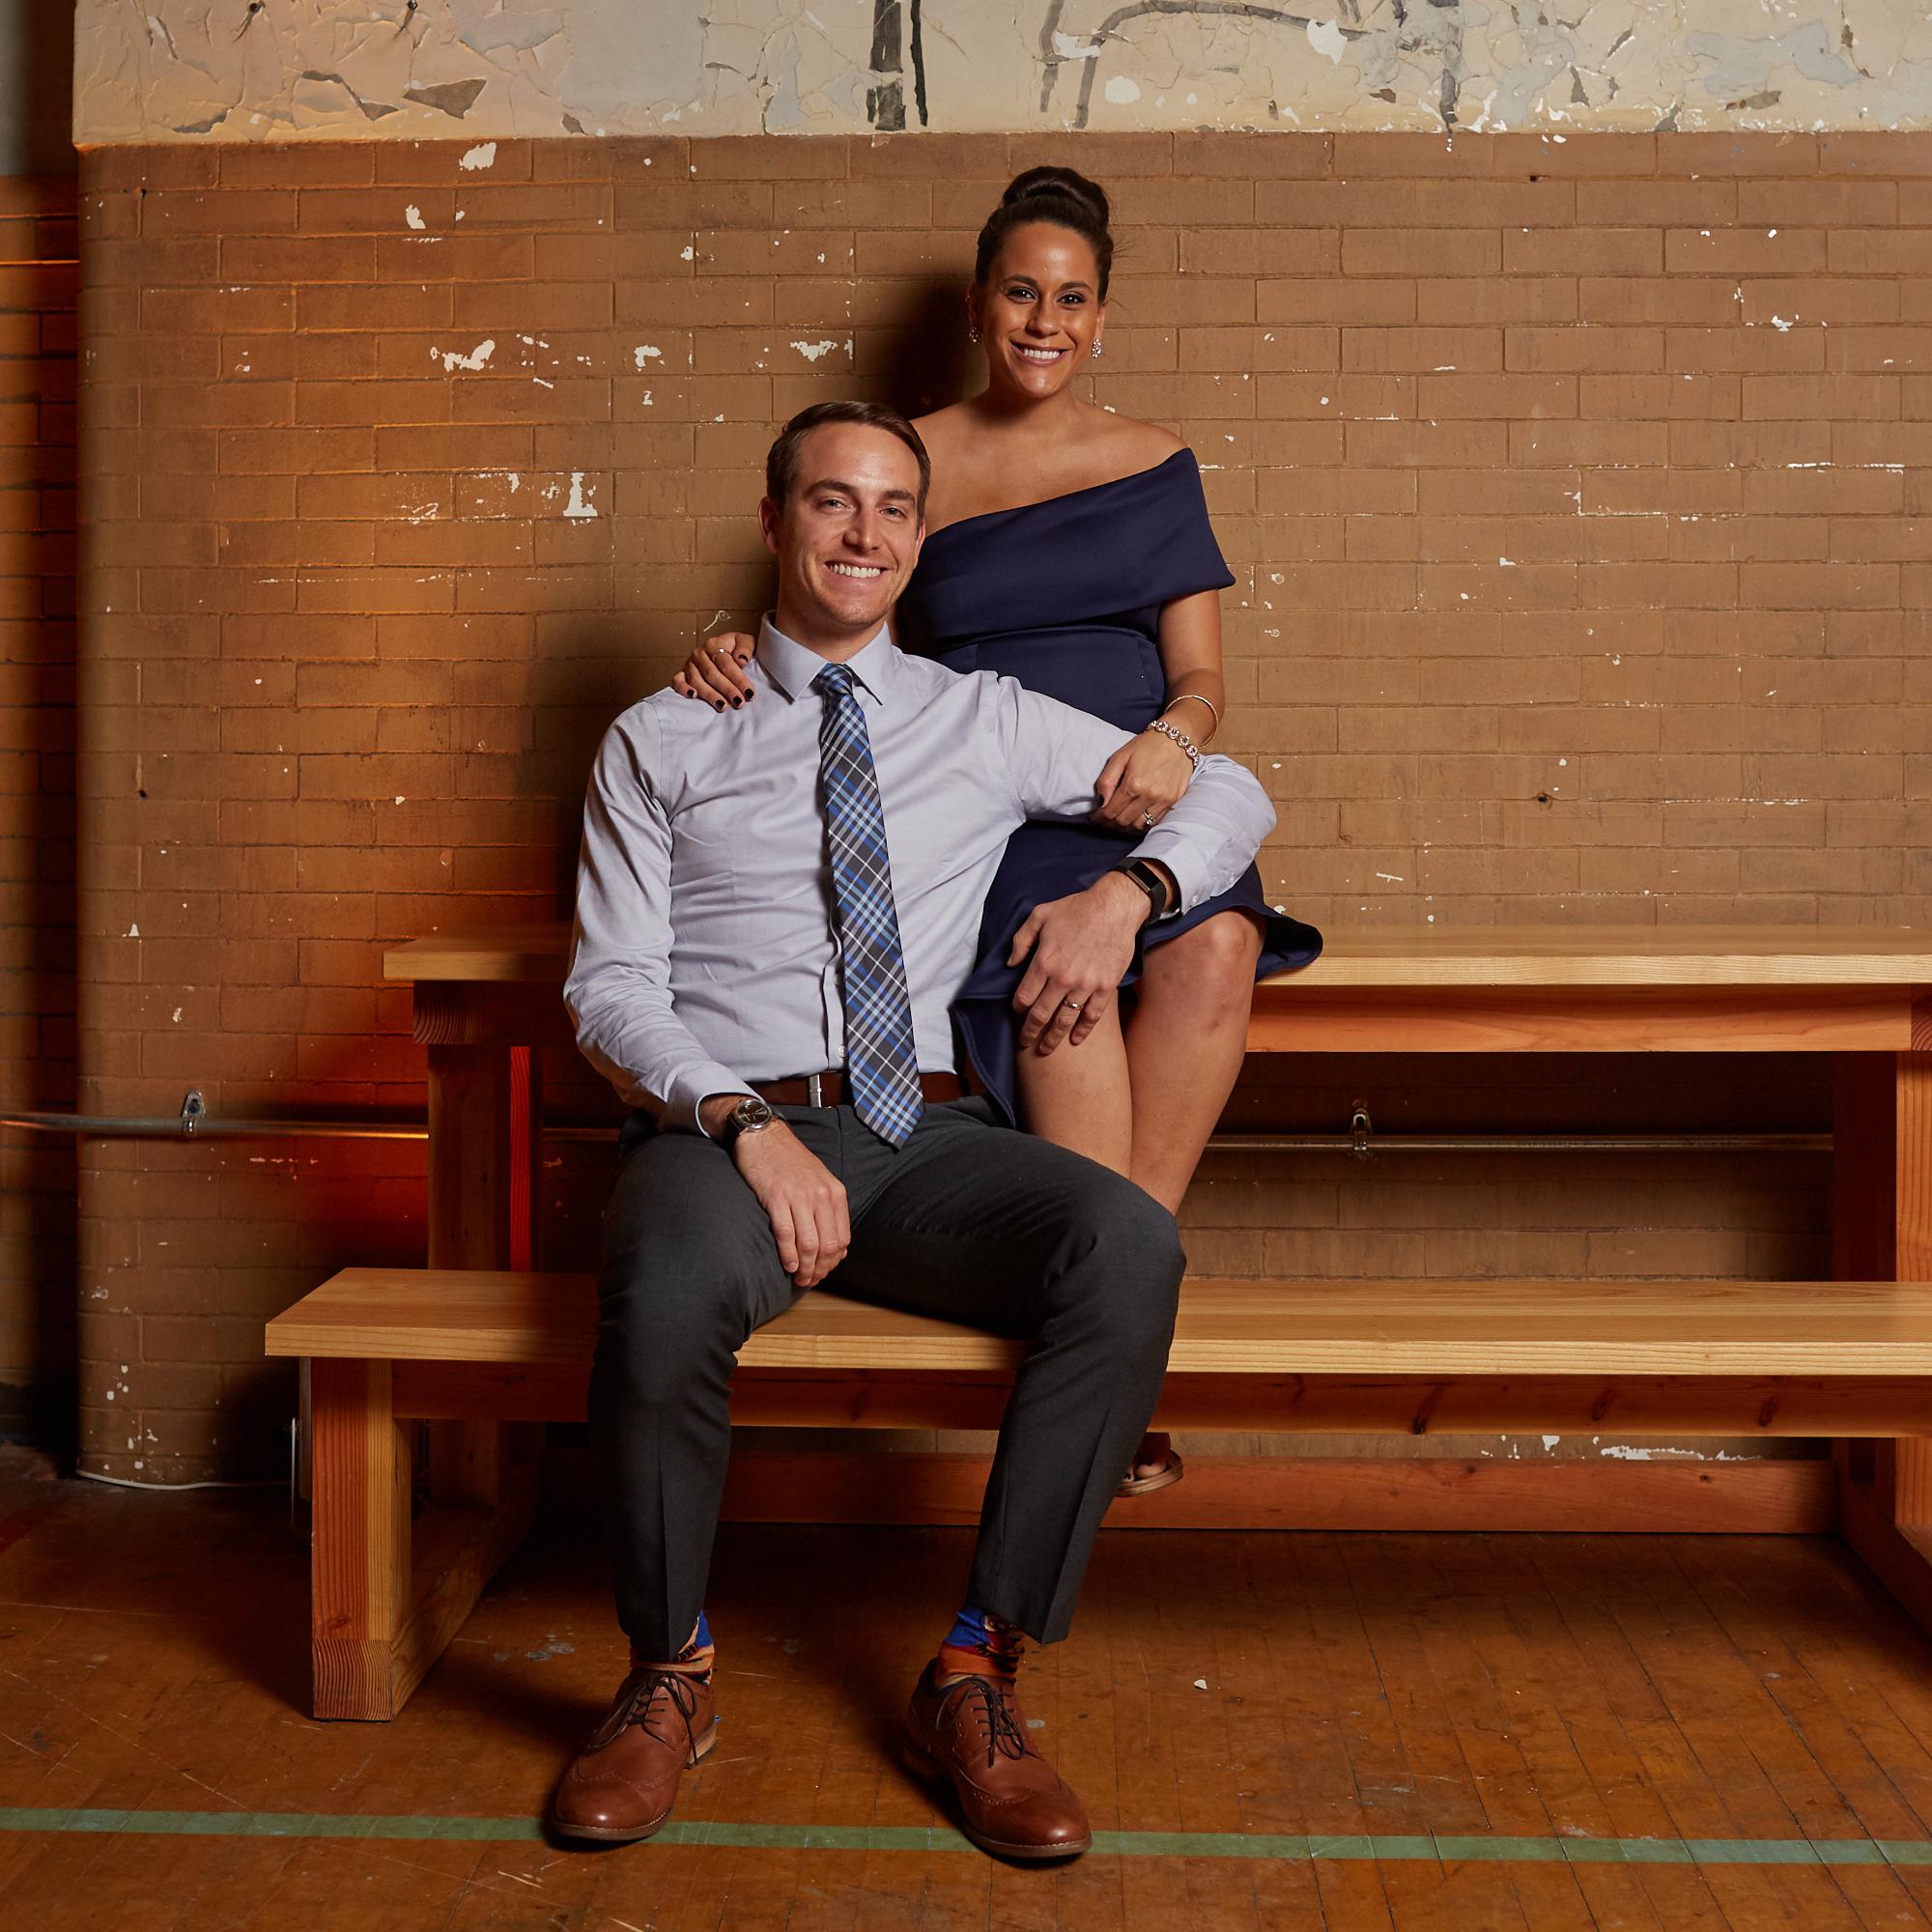 Ryan Hannah Sims - 2017.09 - Wedding Photos - 1022.jpg